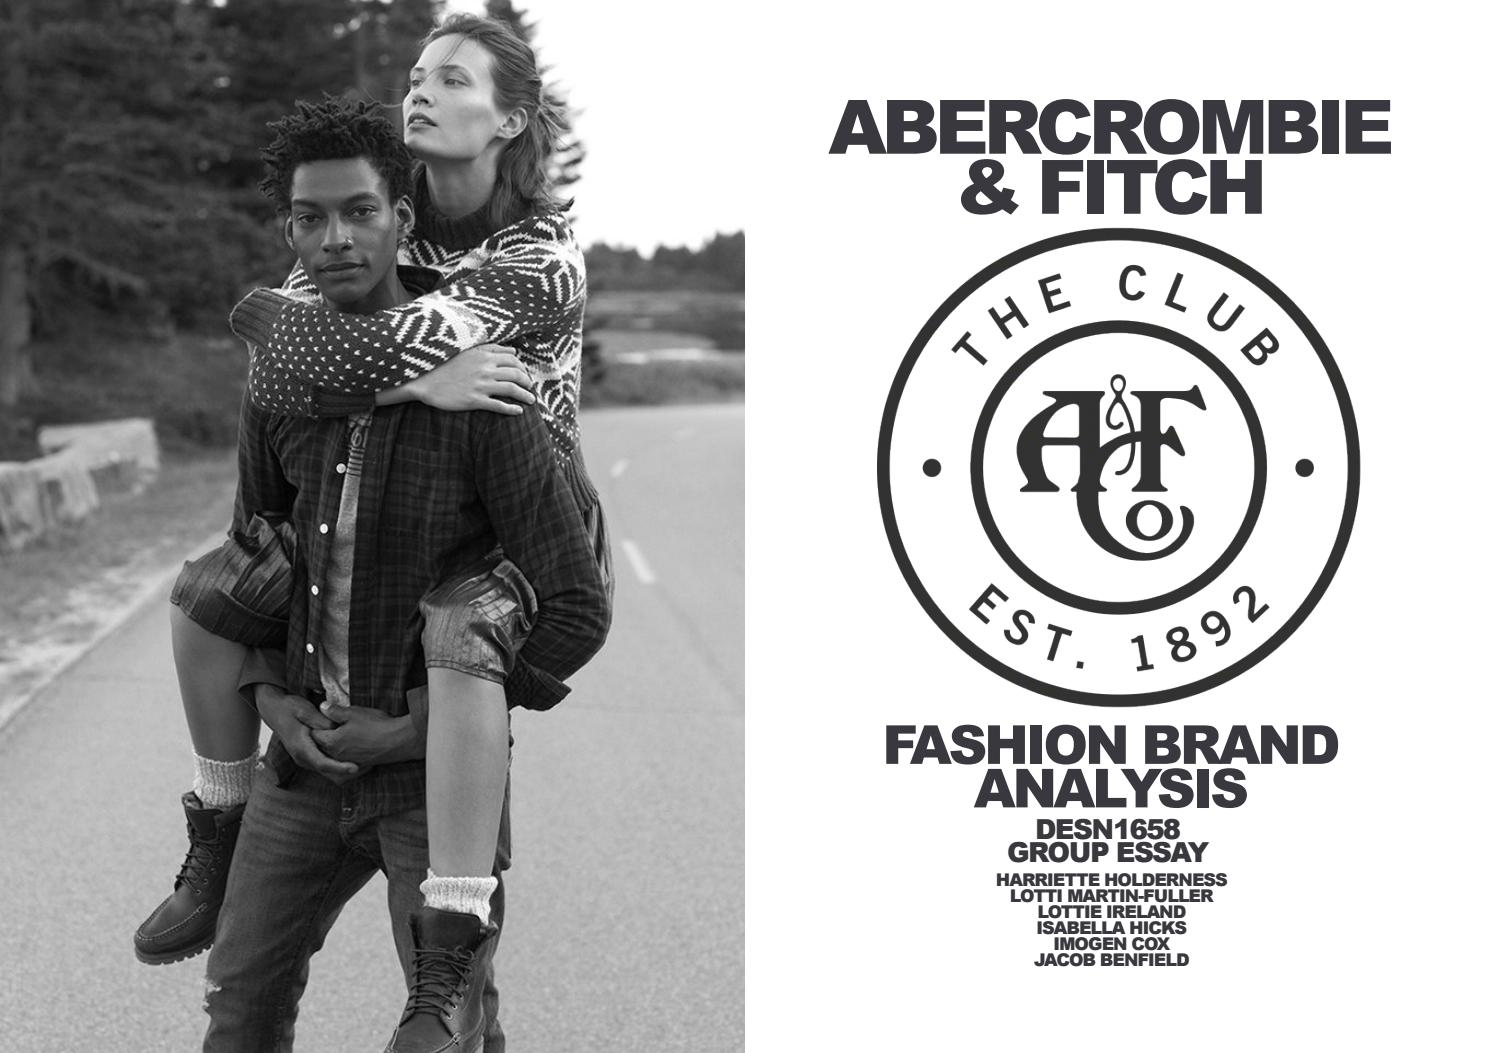 ba9d03f768b Abercrombie   Fitch Rebranding Efforts by Lotti Martin-Fuller - issuu